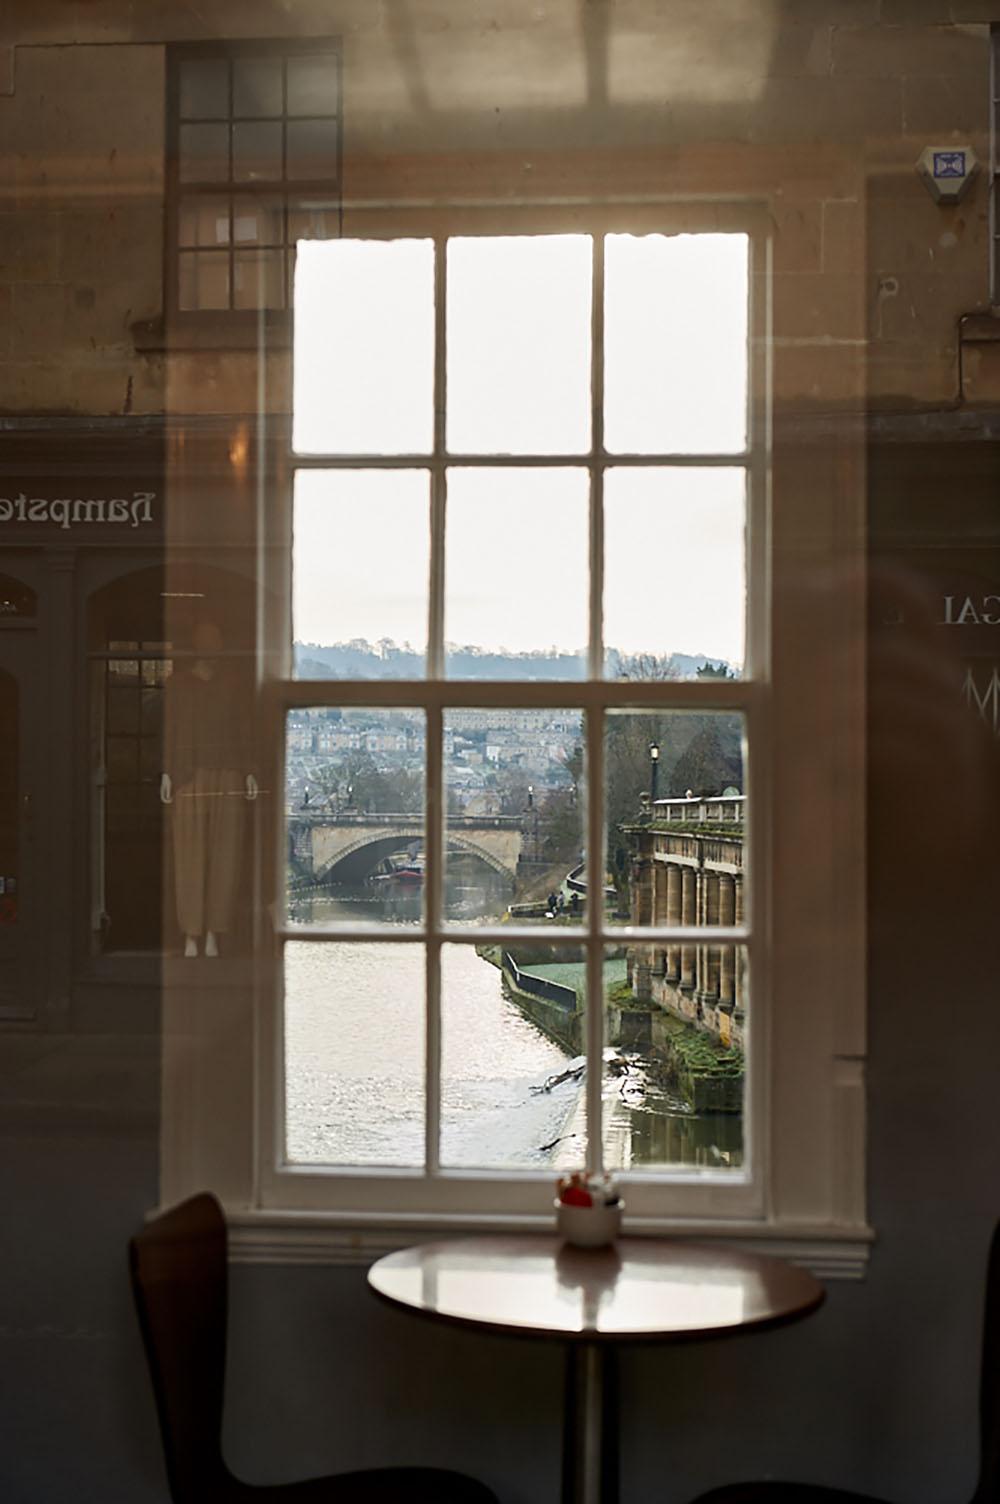 bath, somerset, england, jane austen, town, uk, photos and the city, ursula travels, morning light, pulteney bridge